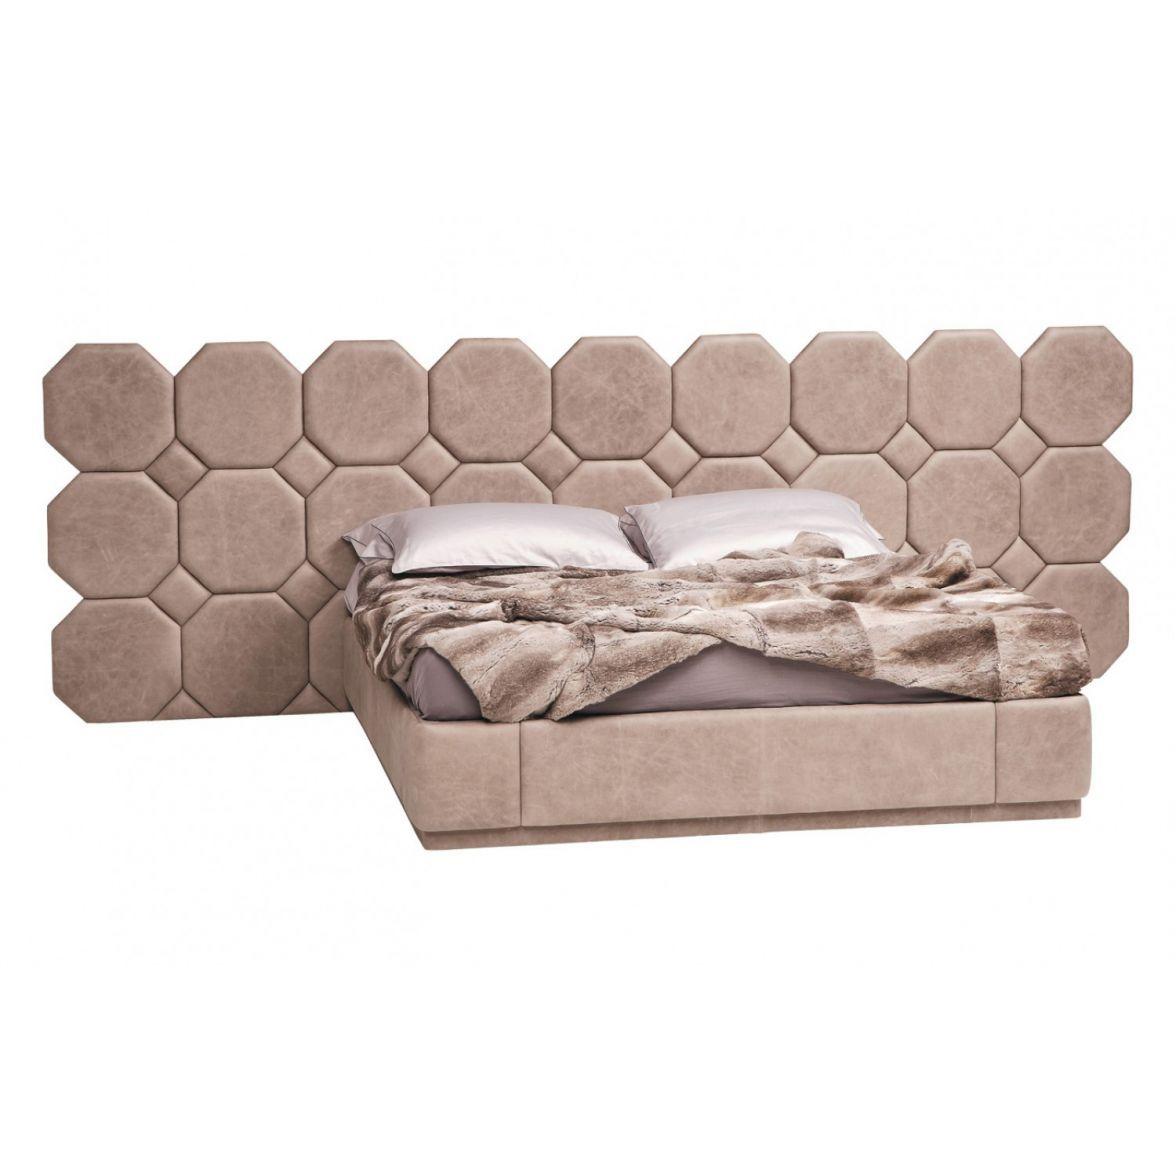 Кровать Pascal фото цена